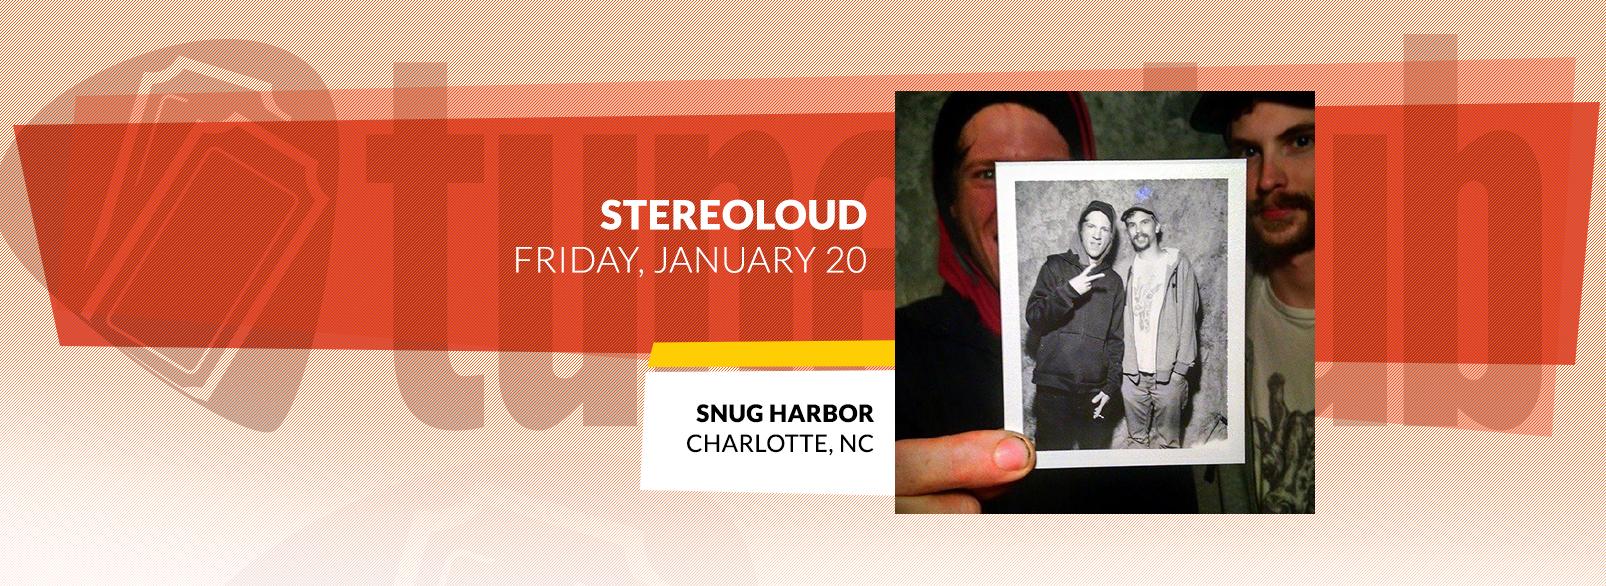 Stereoloud @ Snug Harbor